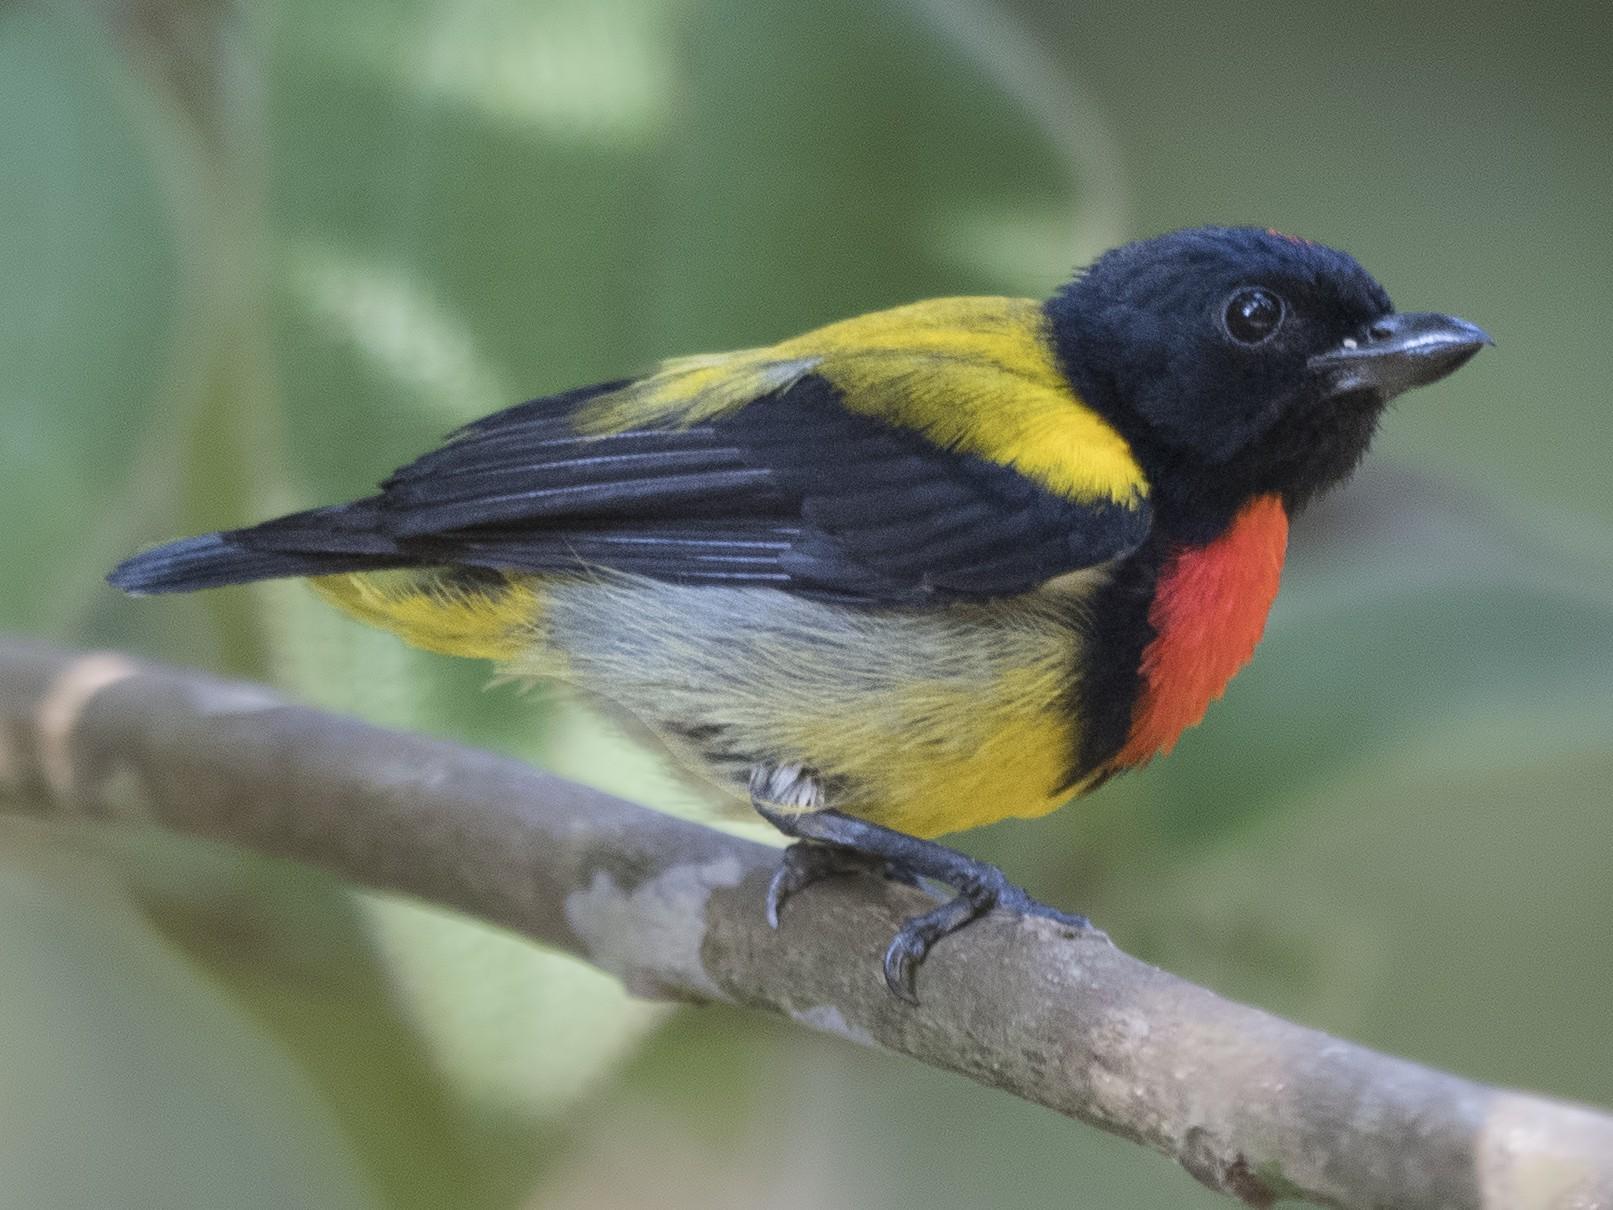 Scarlet-breasted Flowerpecker - Wai Loon Wong